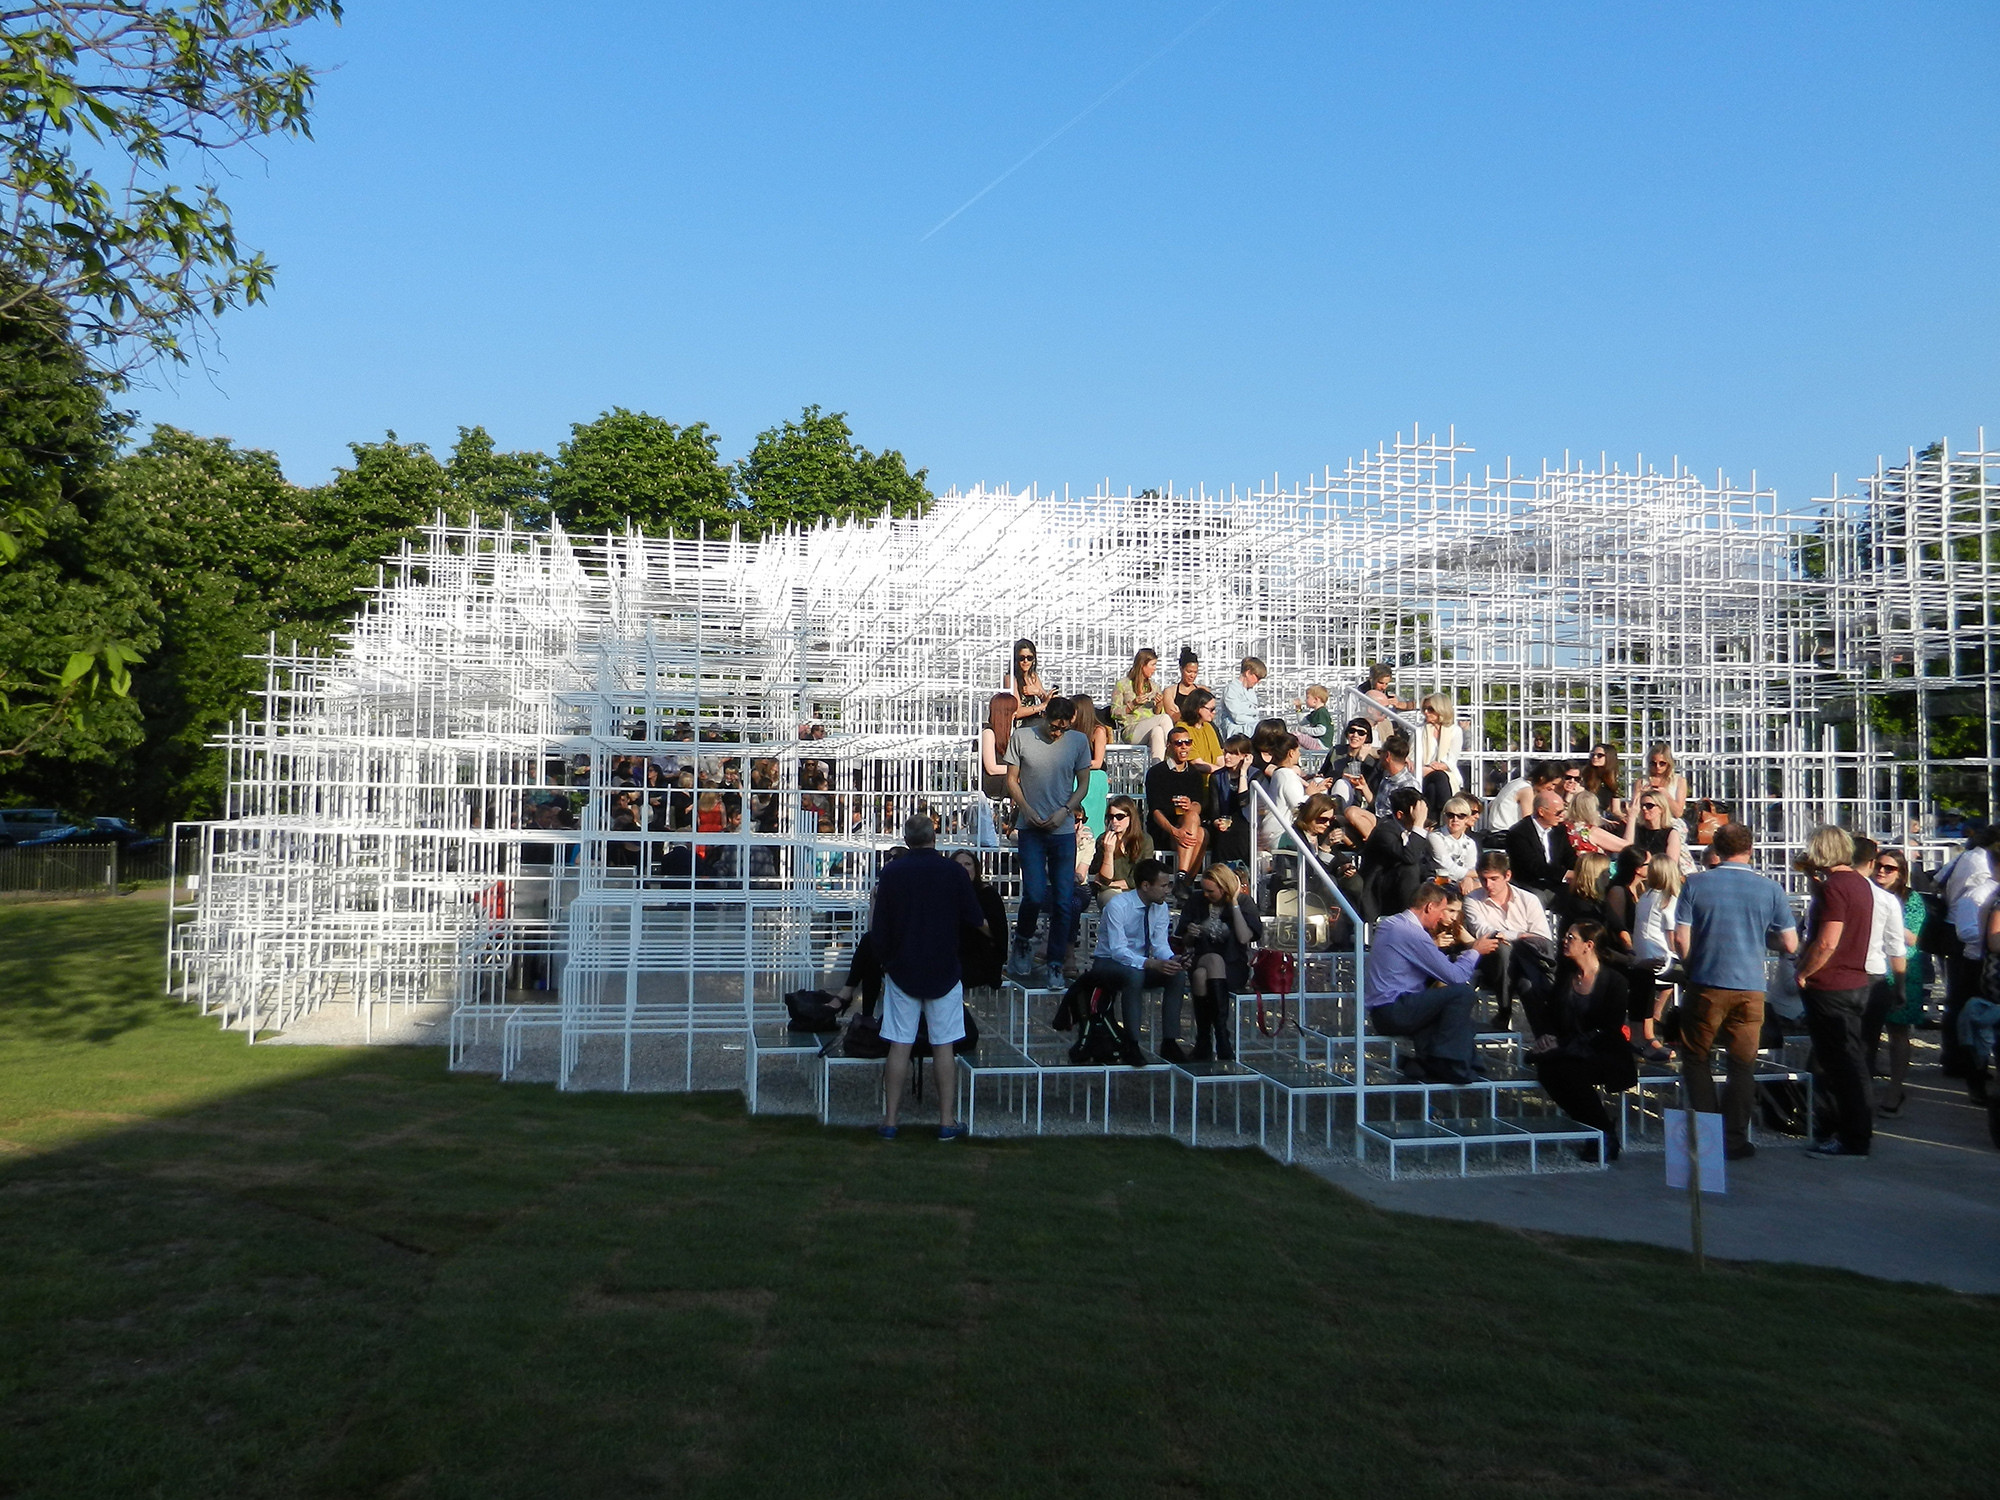 Fujimoto's Serpentine Pavilion Receives High Praise from Critics, © Daniel Portilla